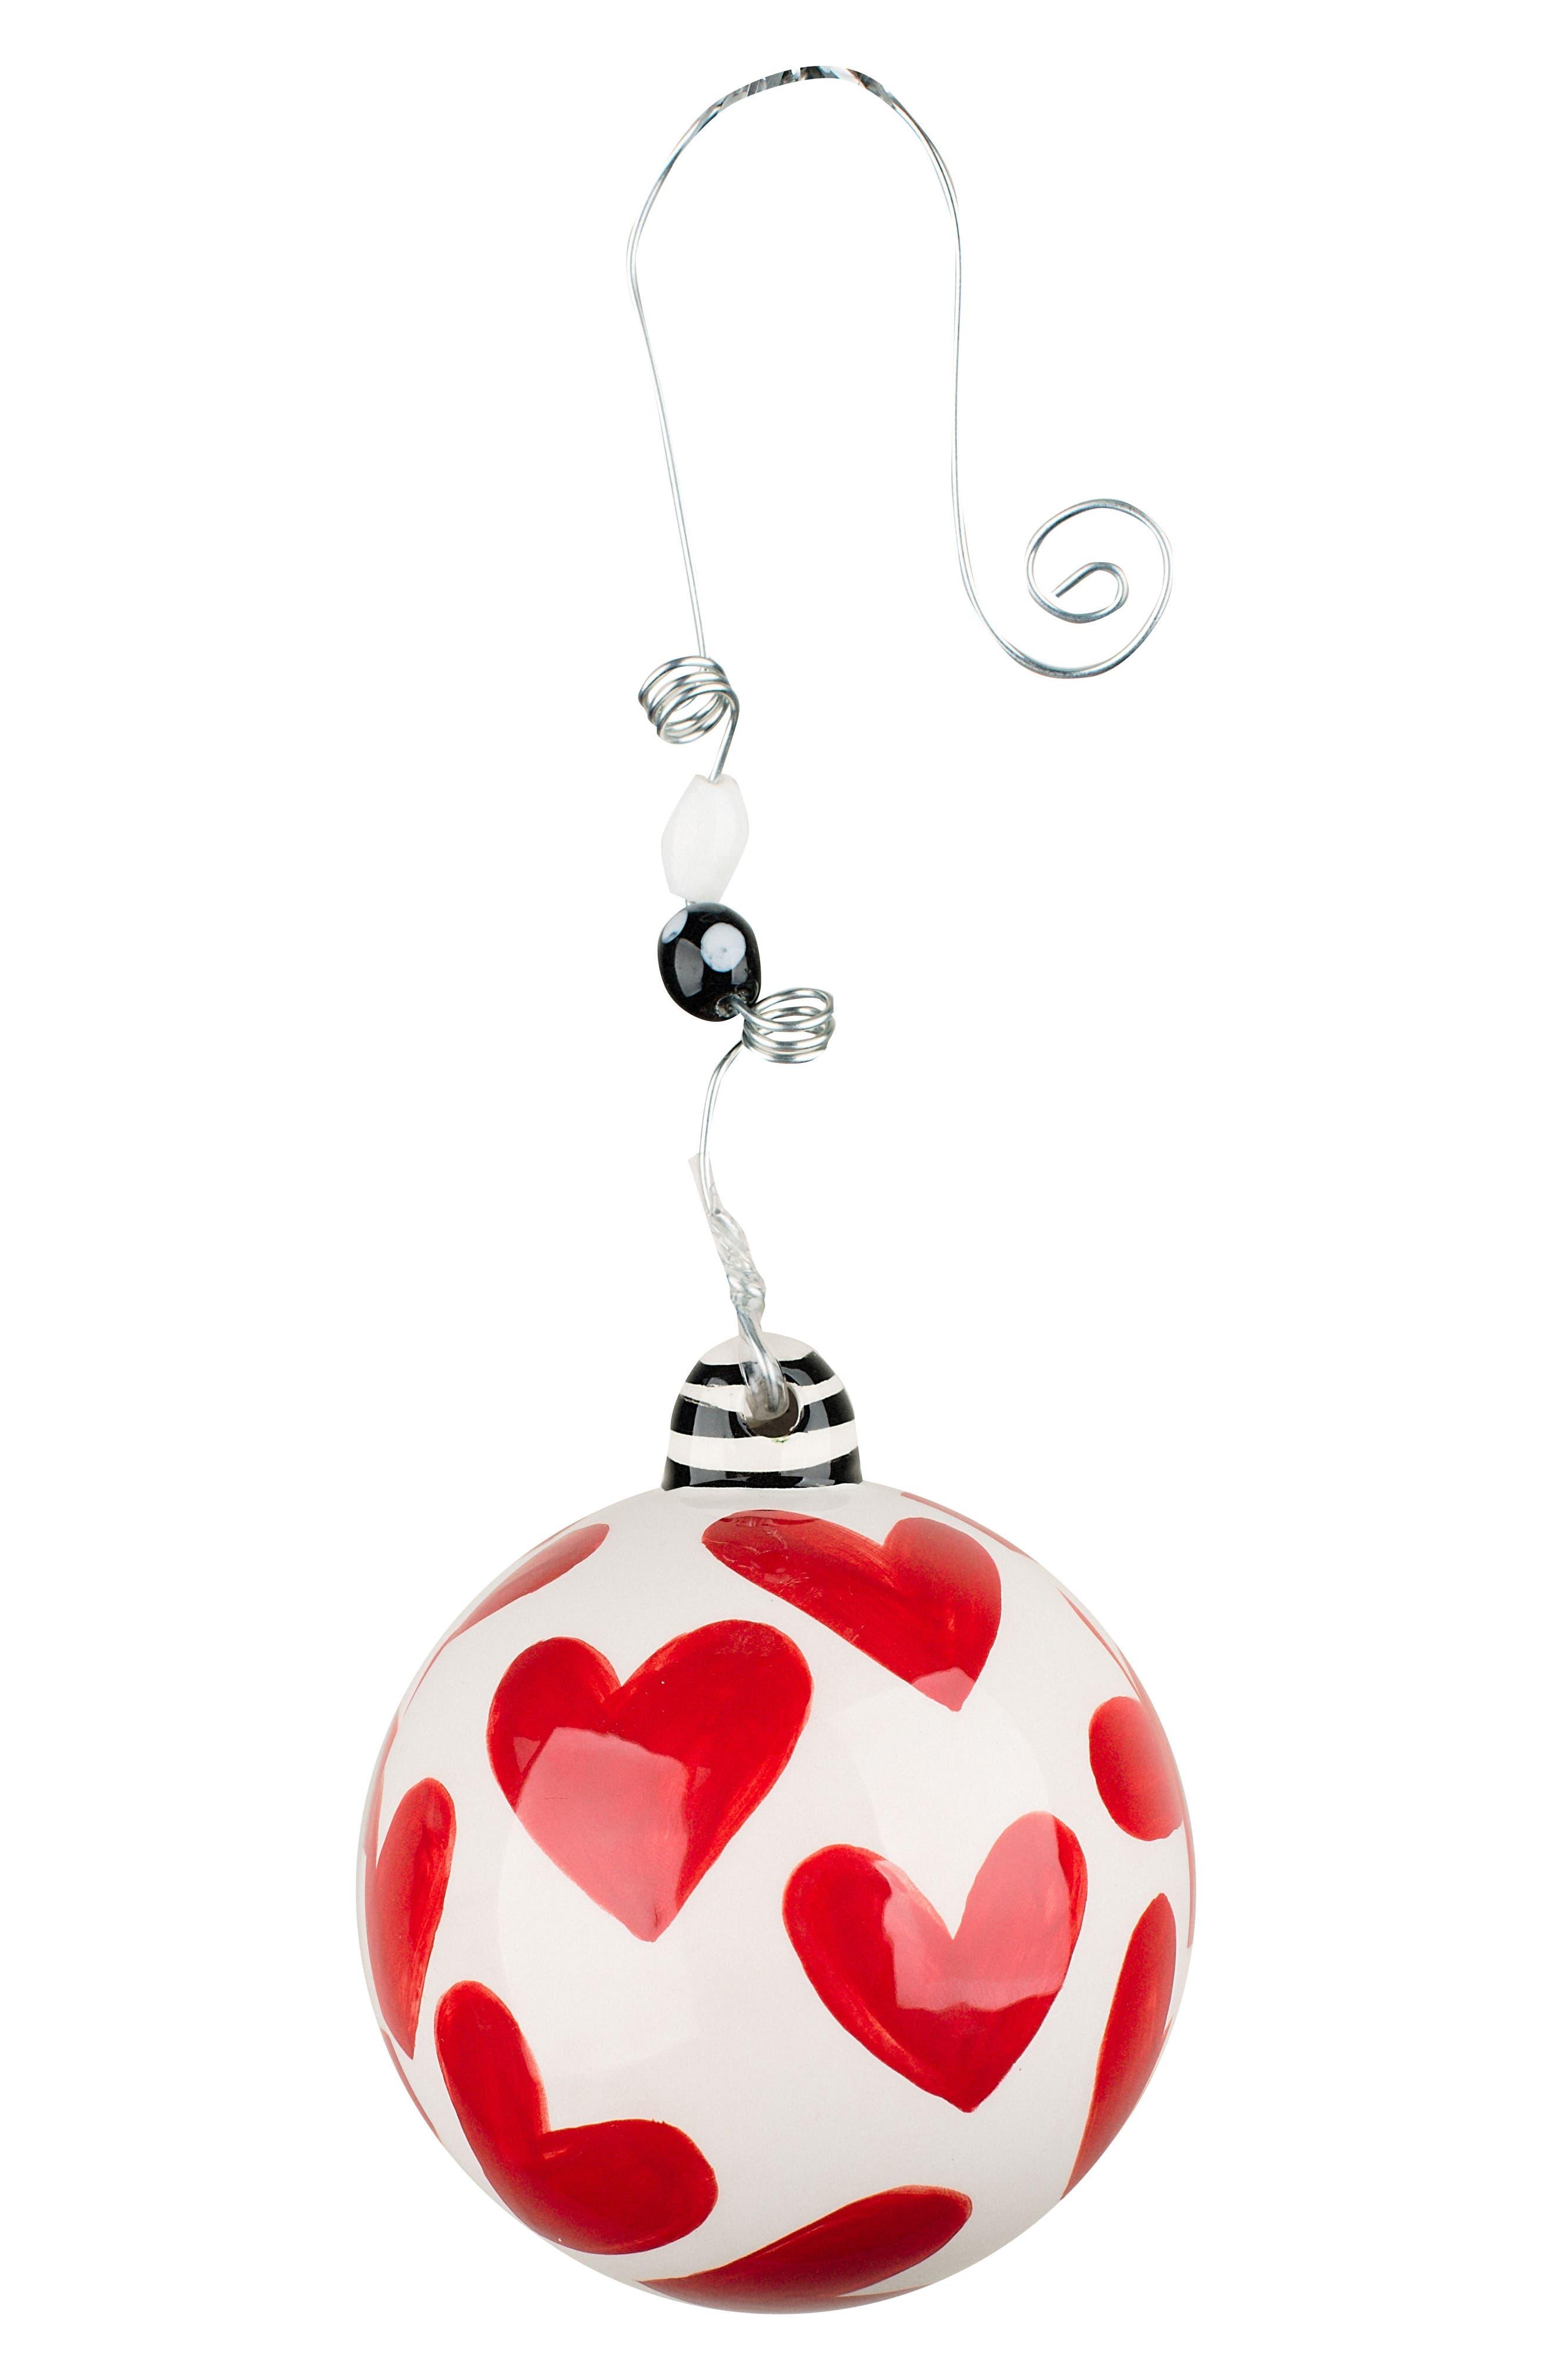 Love You More Ball Ornament,                             Alternate thumbnail 2, color,                             900